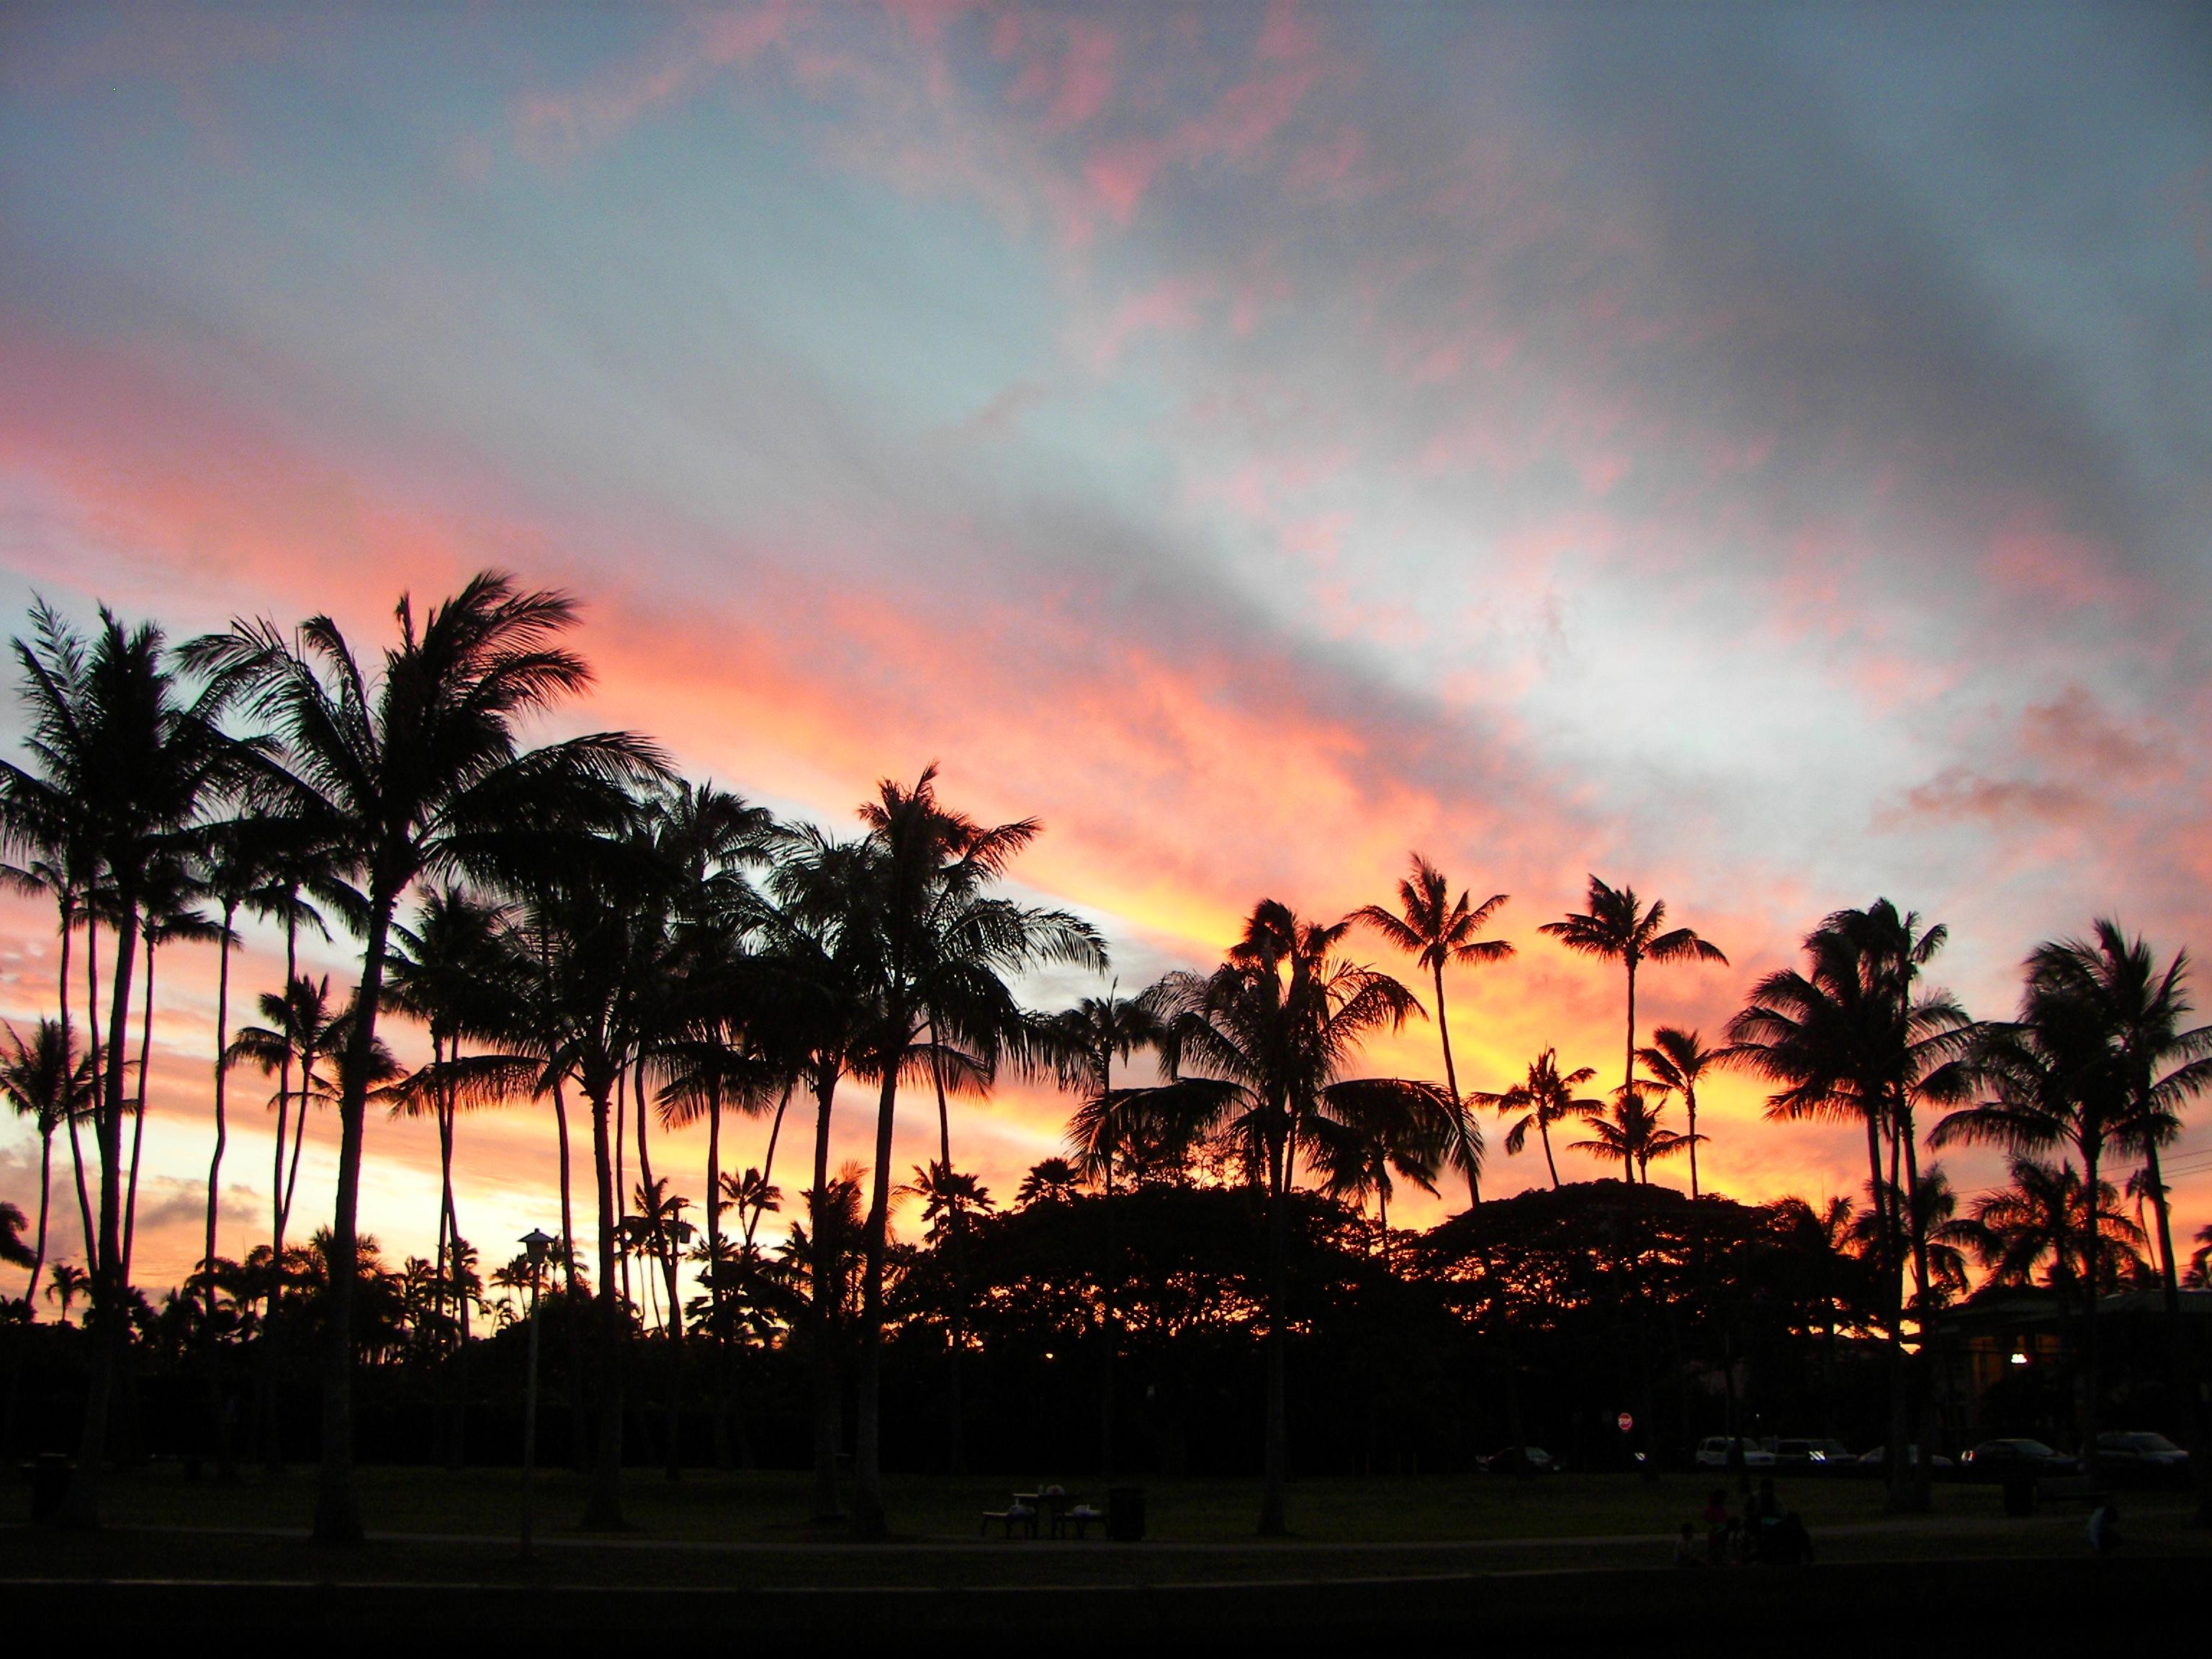 Palm Trees Sunset - Kaimuki, Oahu